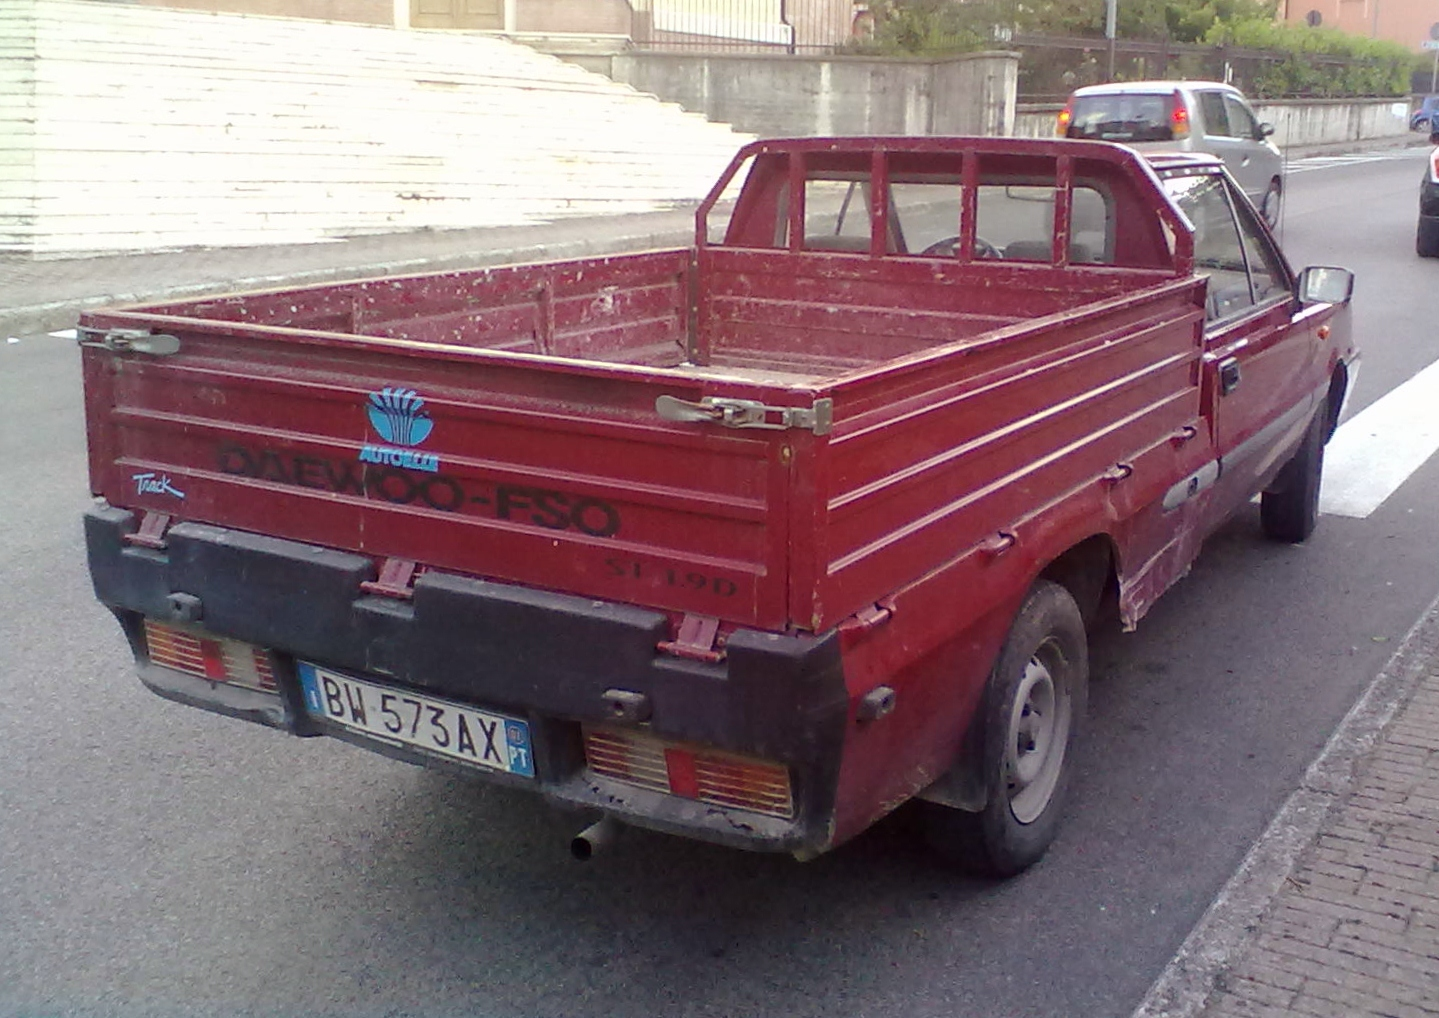 File:Daewoo-FSO Polonez Truck 1.9D.jpg - Wikimedia Commons